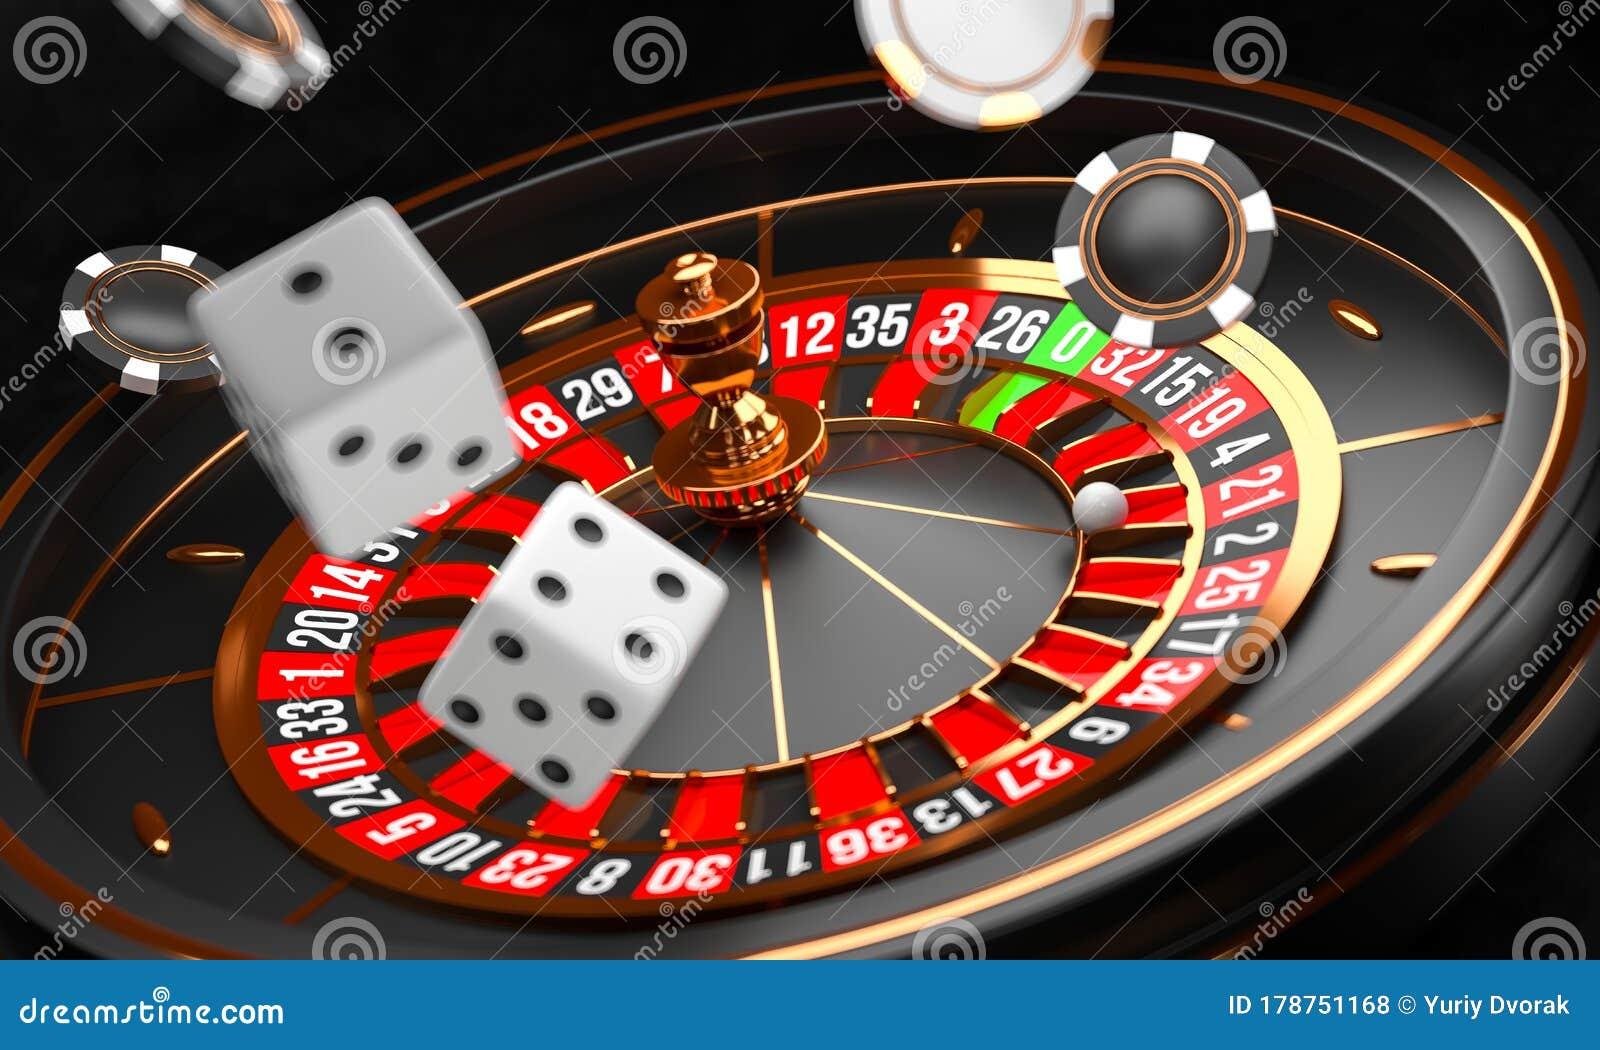 Roulette Wheel Free Online Peatix